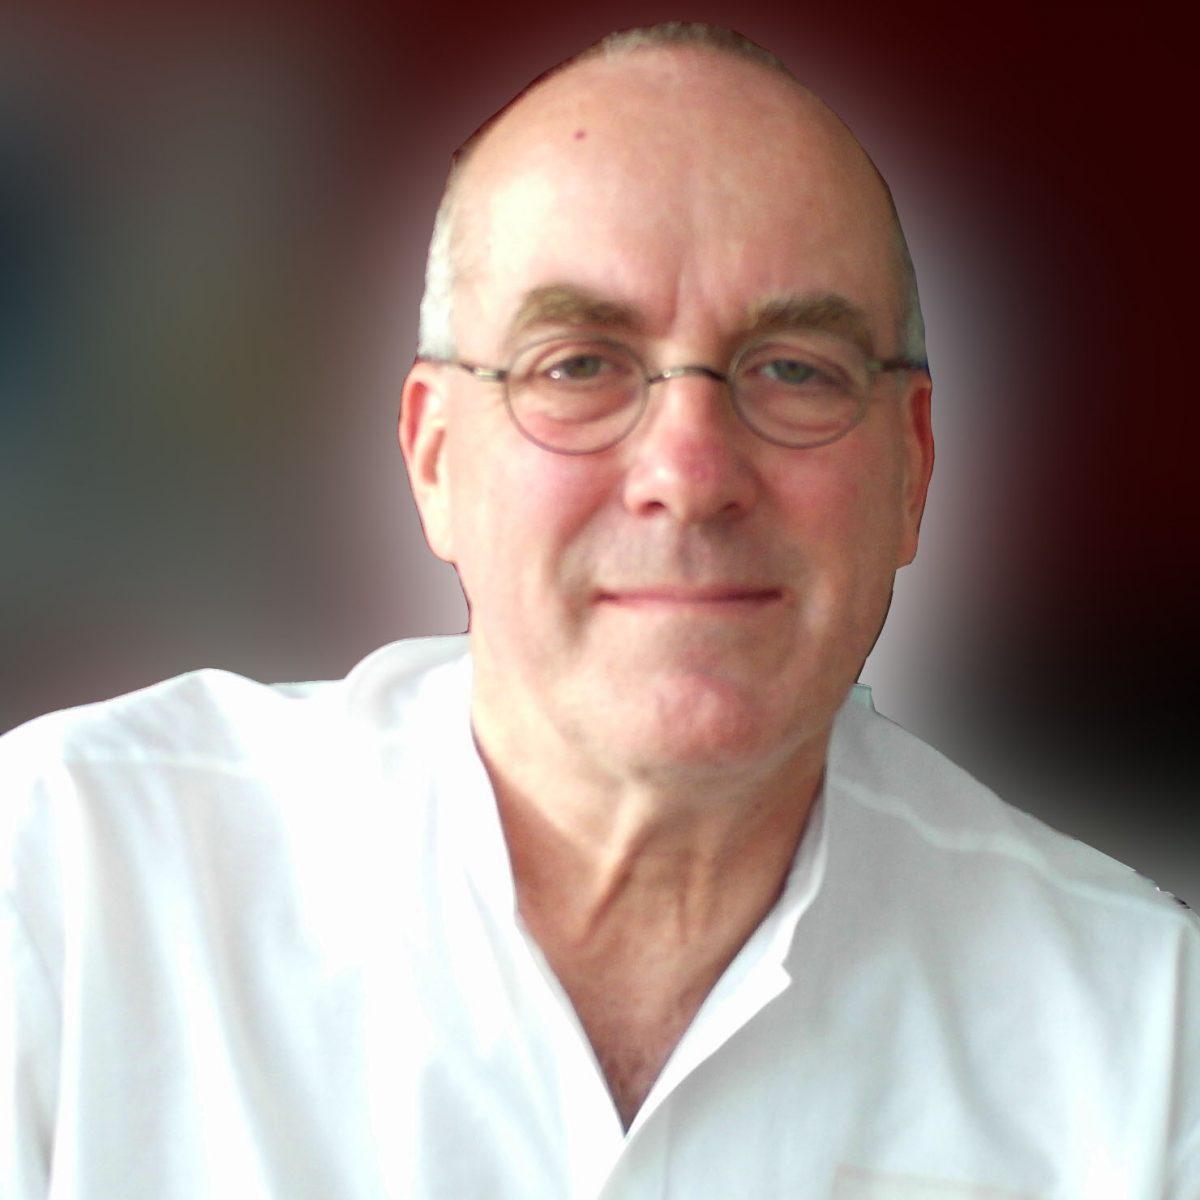 Dr Ralf Geske